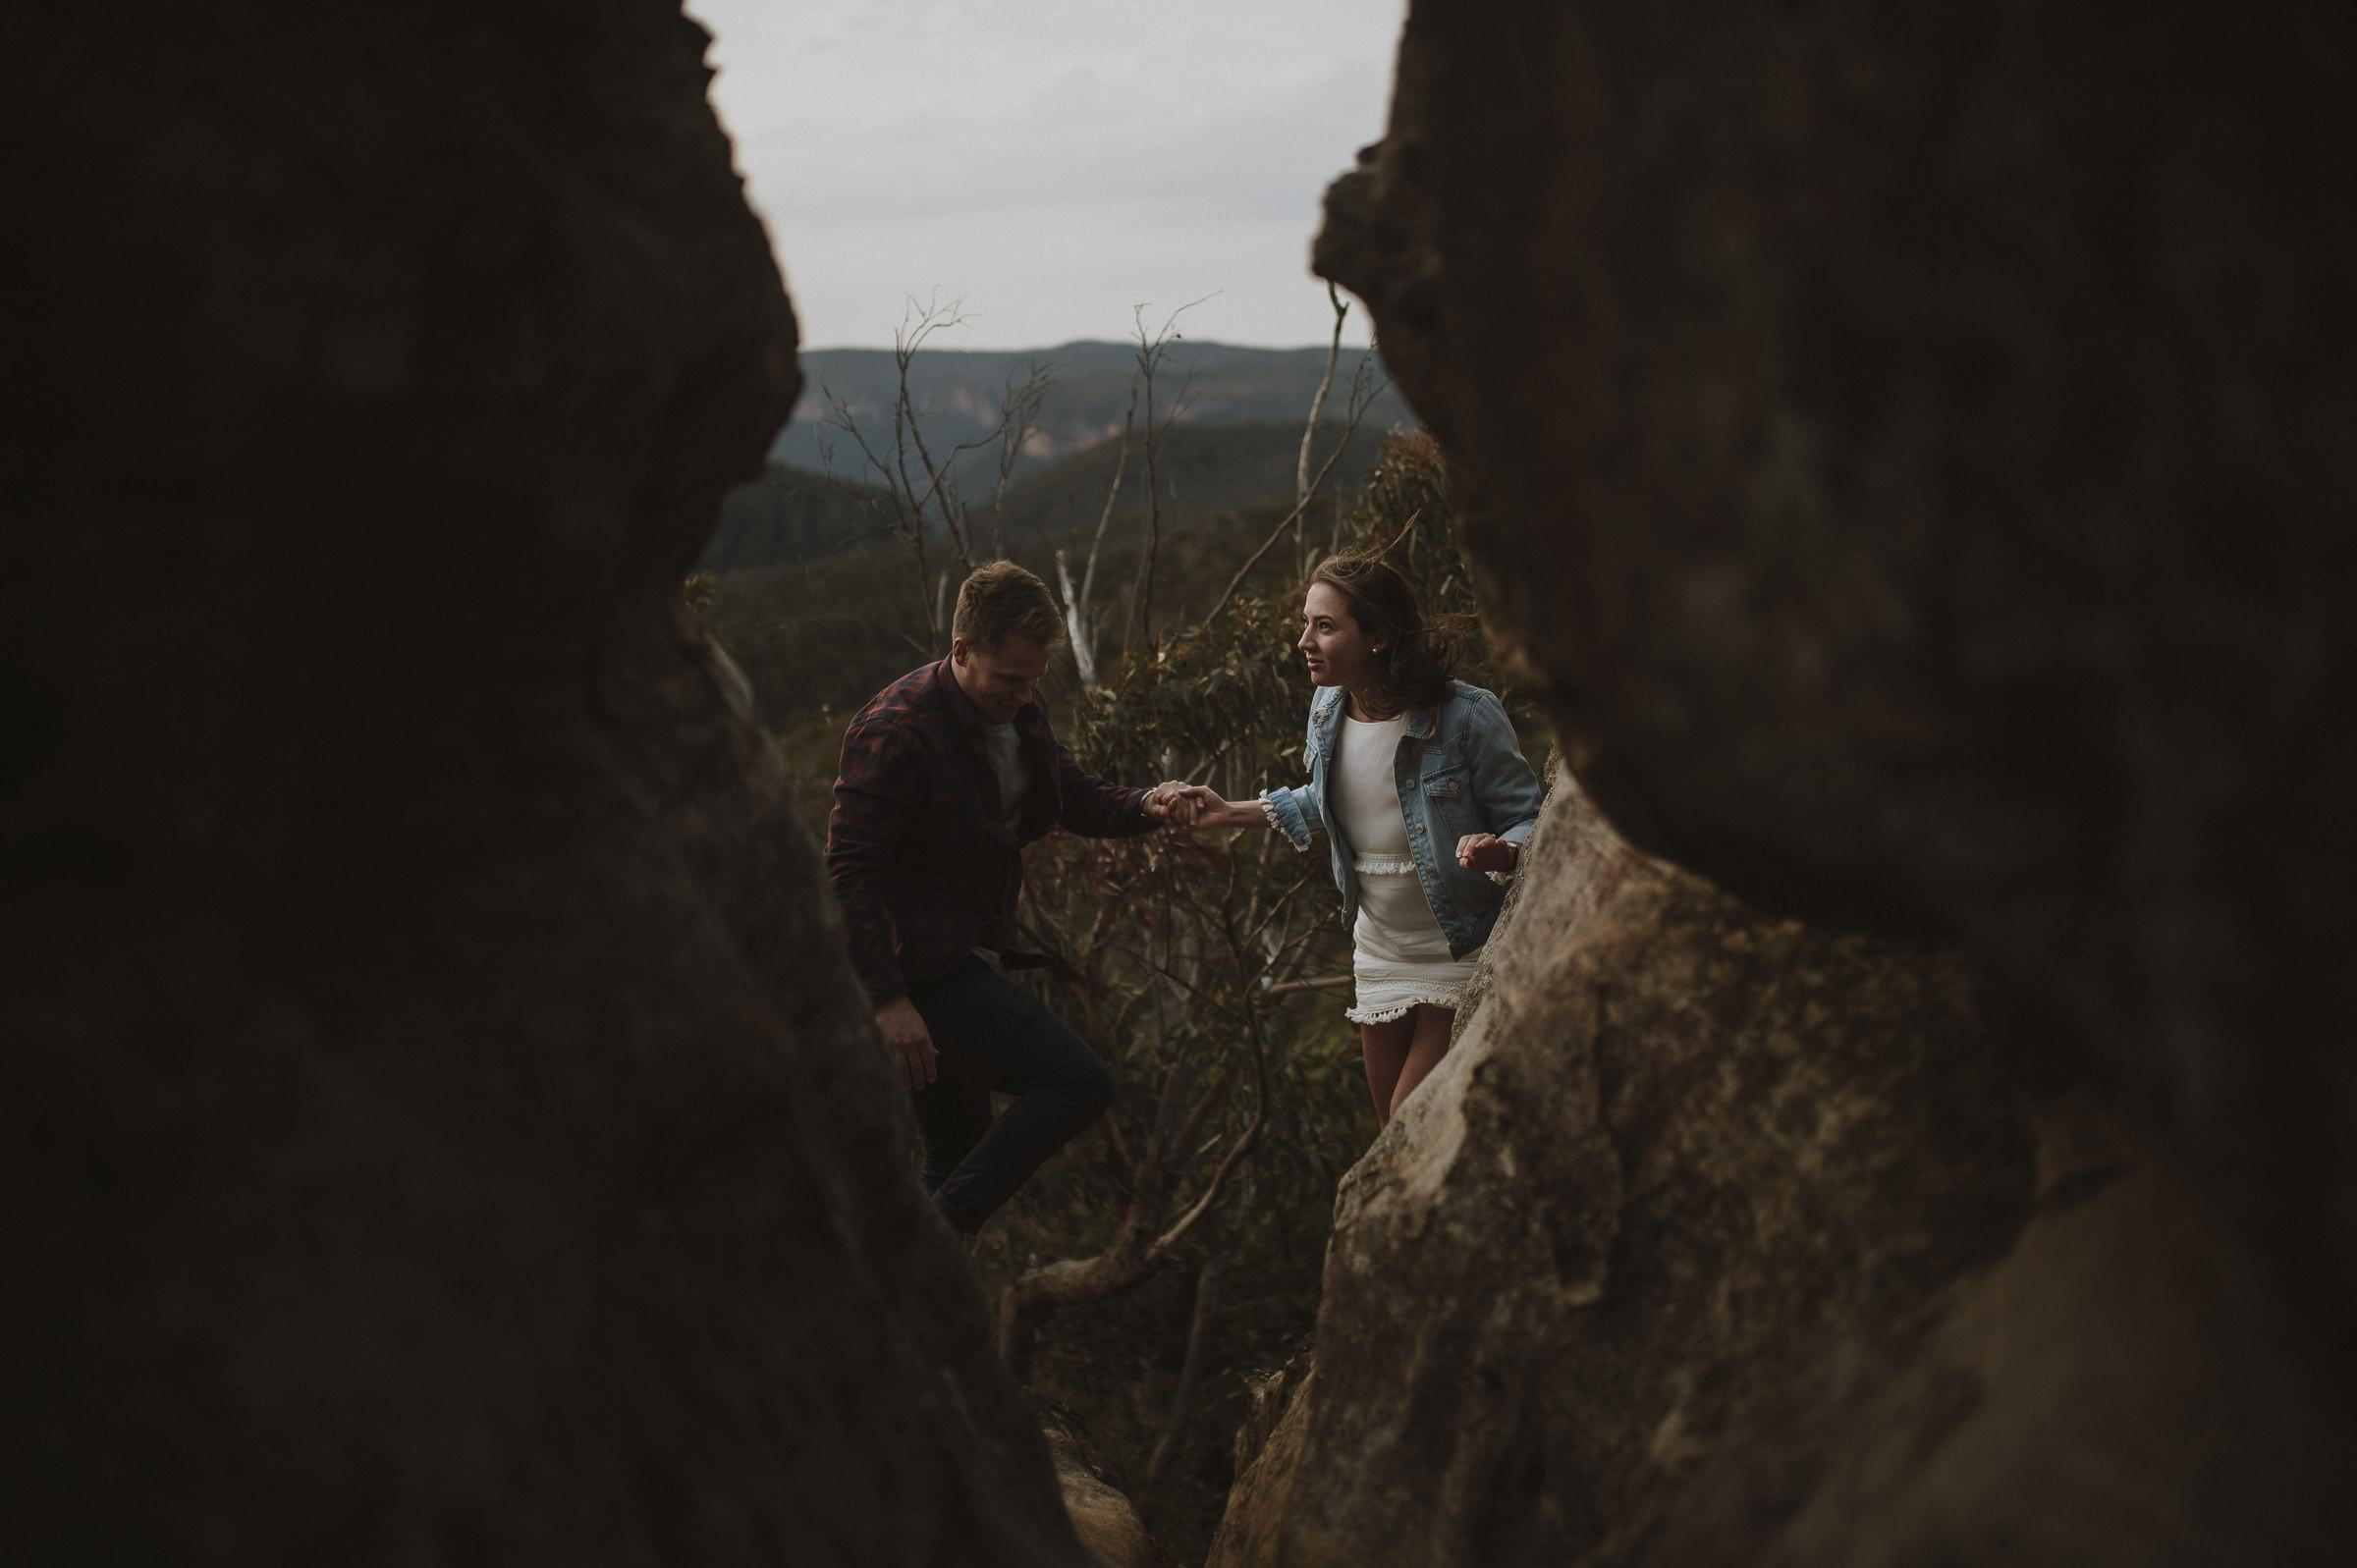 Caitlin_George_Blue_Mountains_Engagement_Shoot_Blog-31.jpg